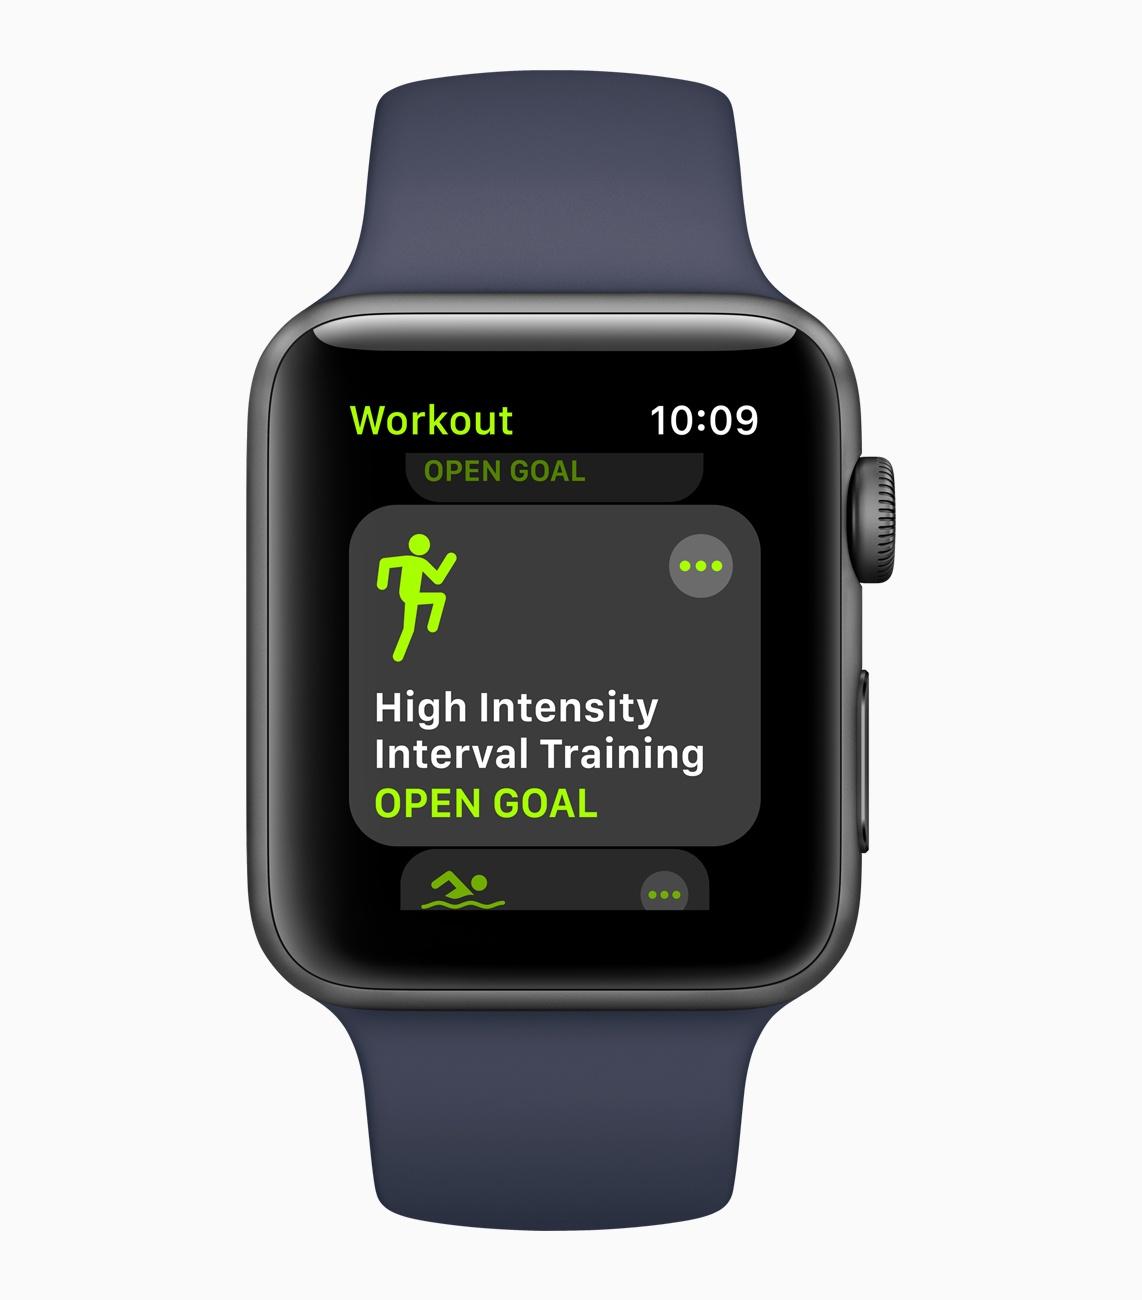 apple watch new update wellable employee wellness